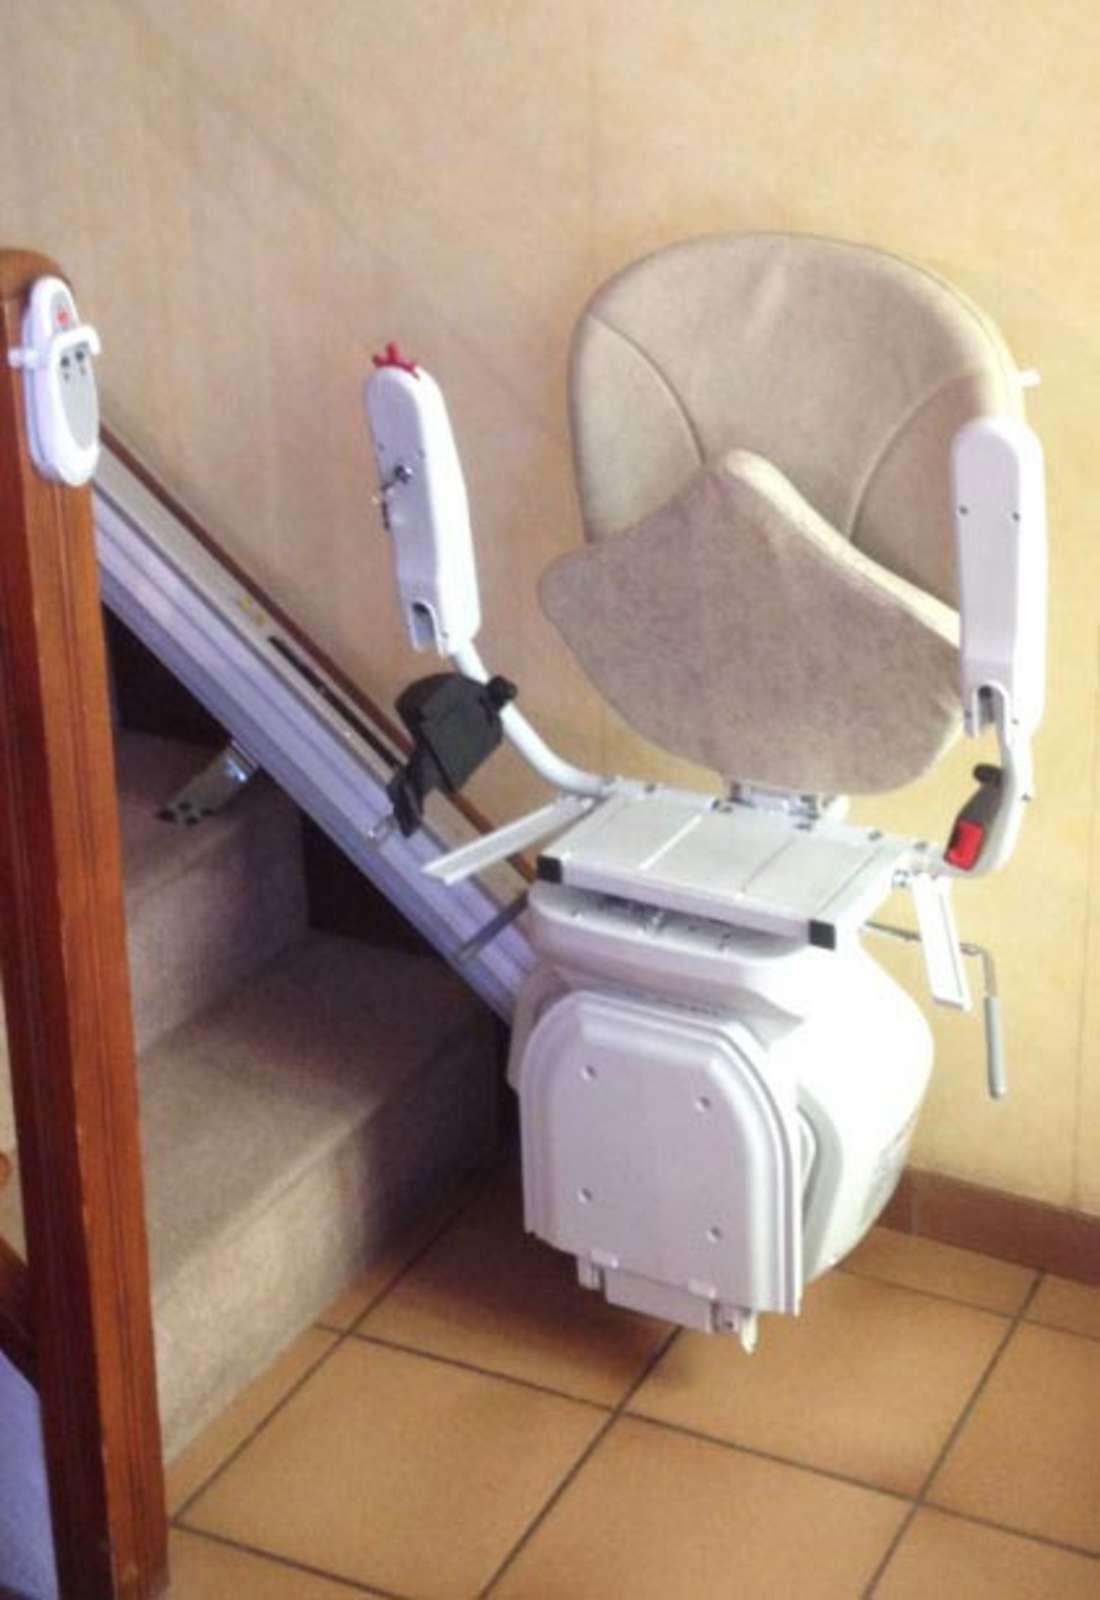 chaise monte escalier horizon plus meyras 07380. Black Bedroom Furniture Sets. Home Design Ideas